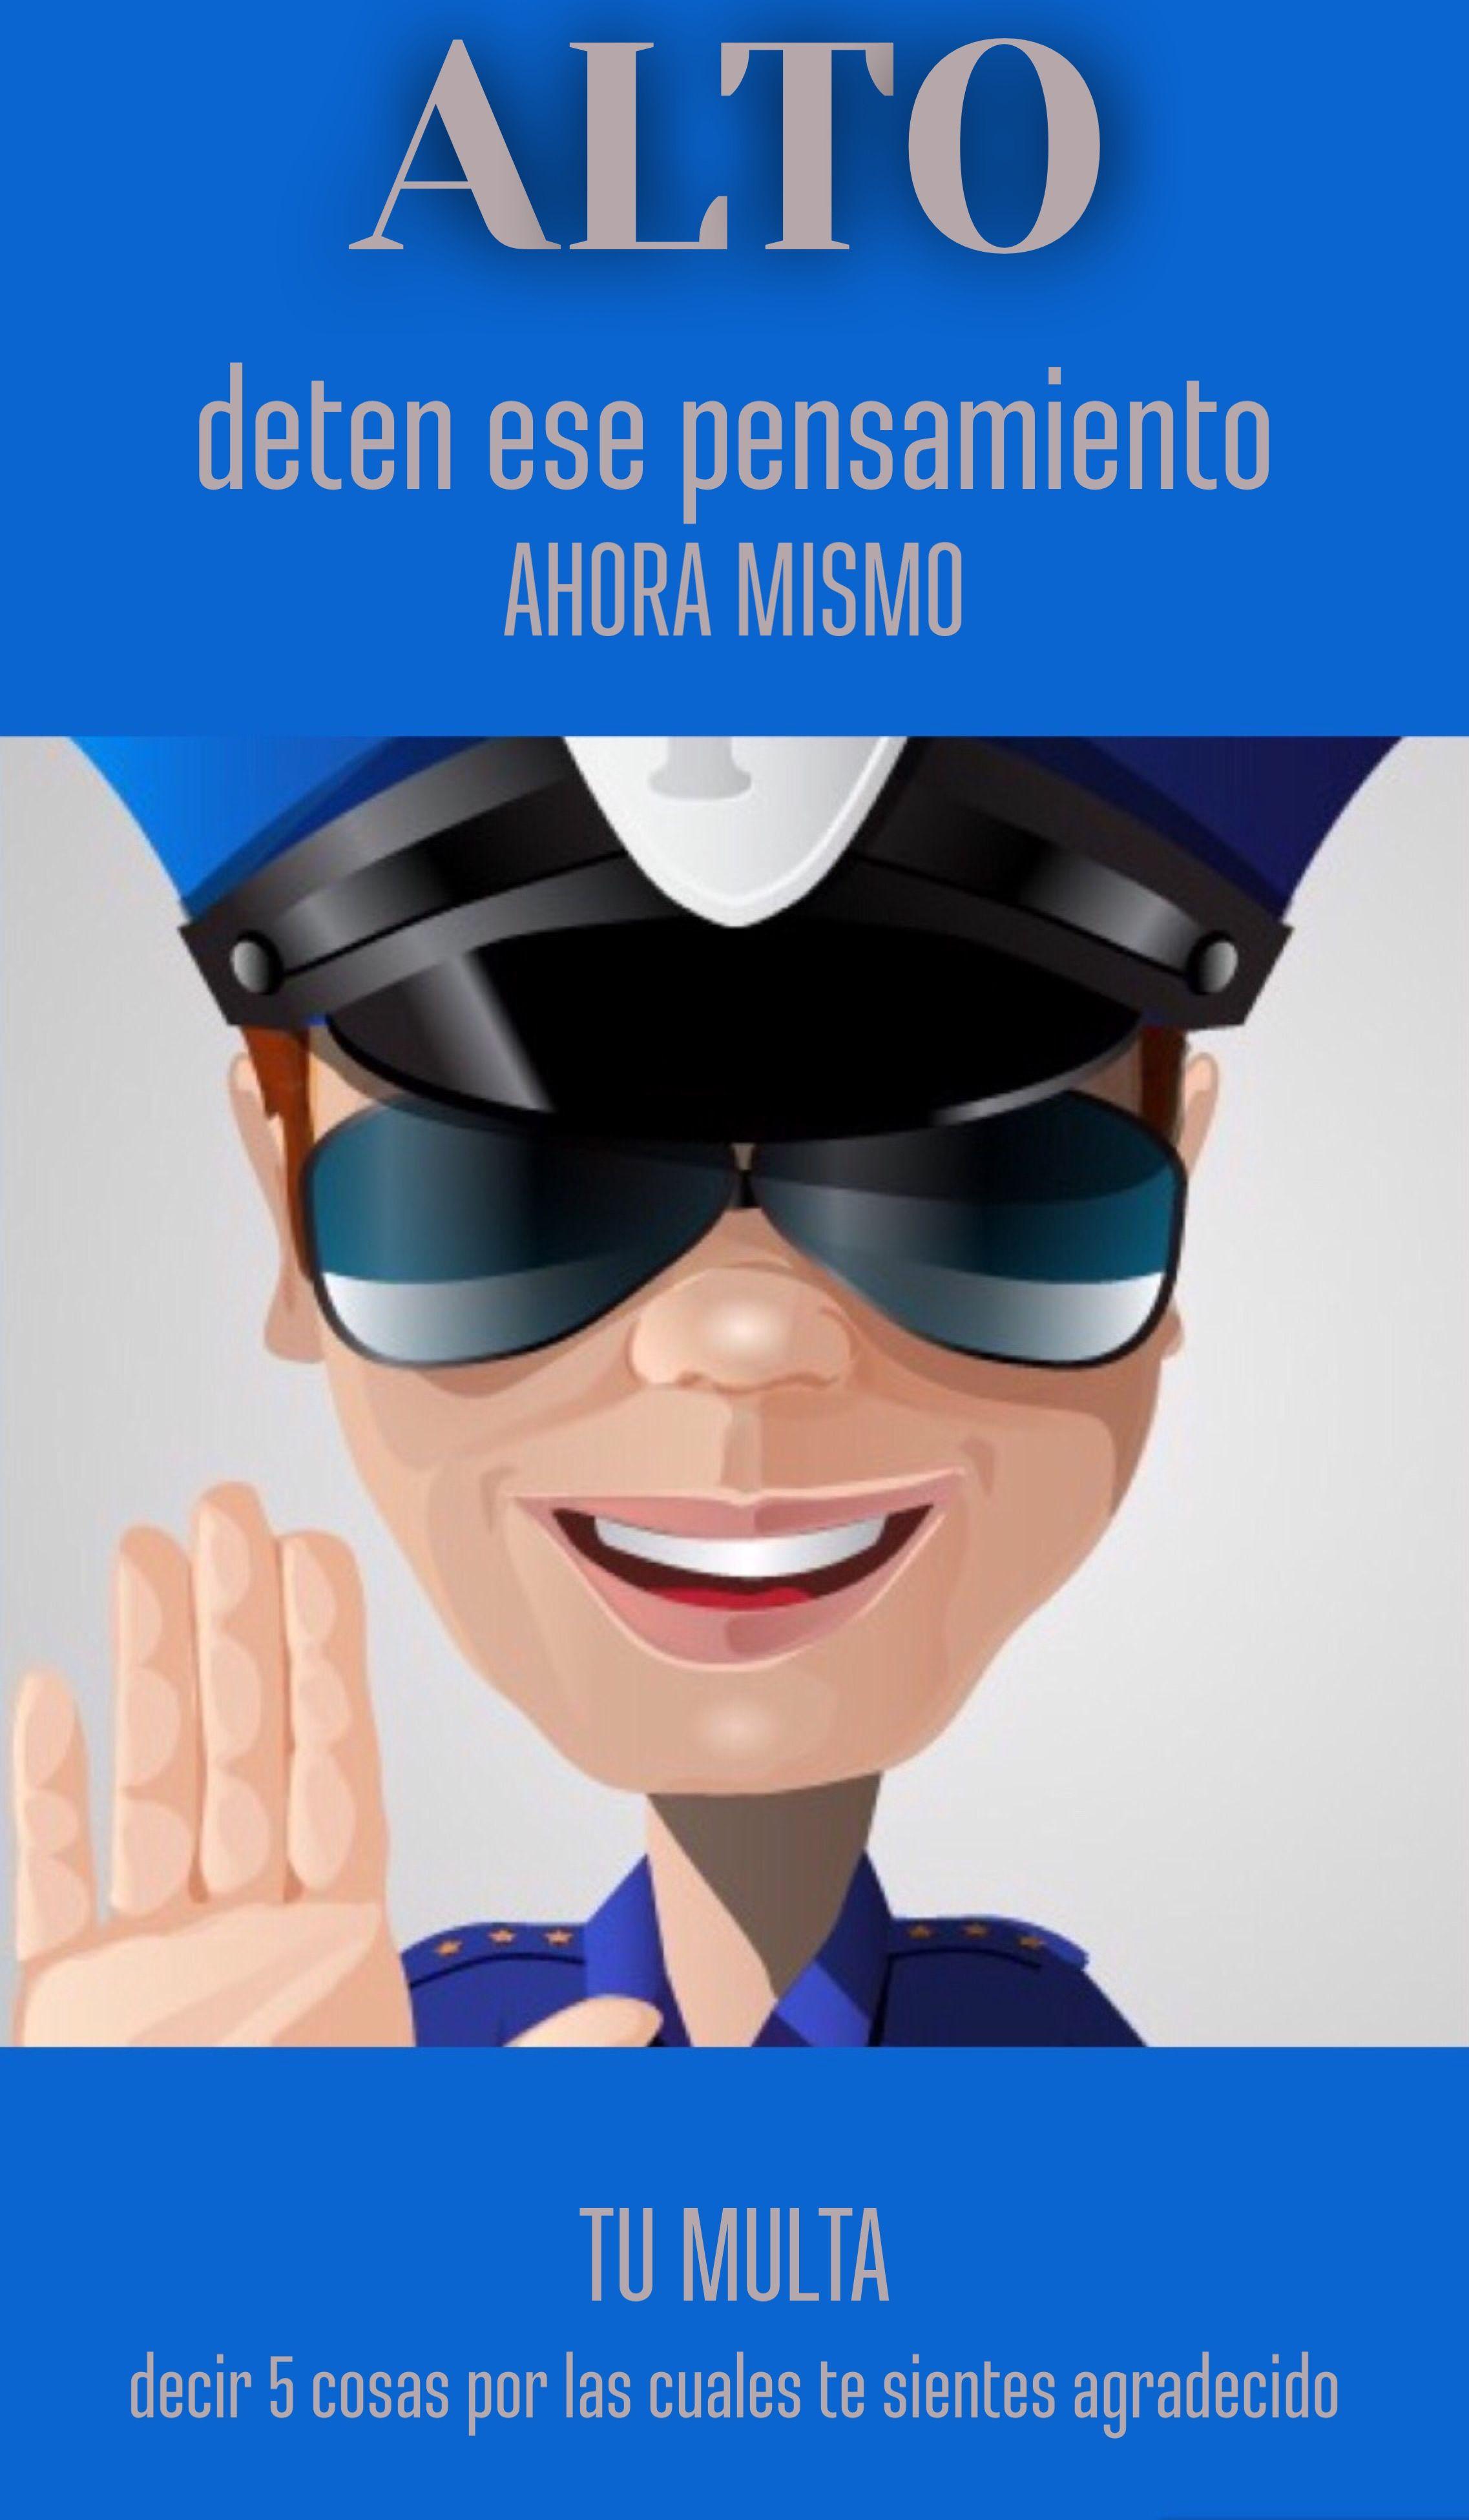 Alto Deten Esos Pensamientos Mujer Policia Frases Pinterest